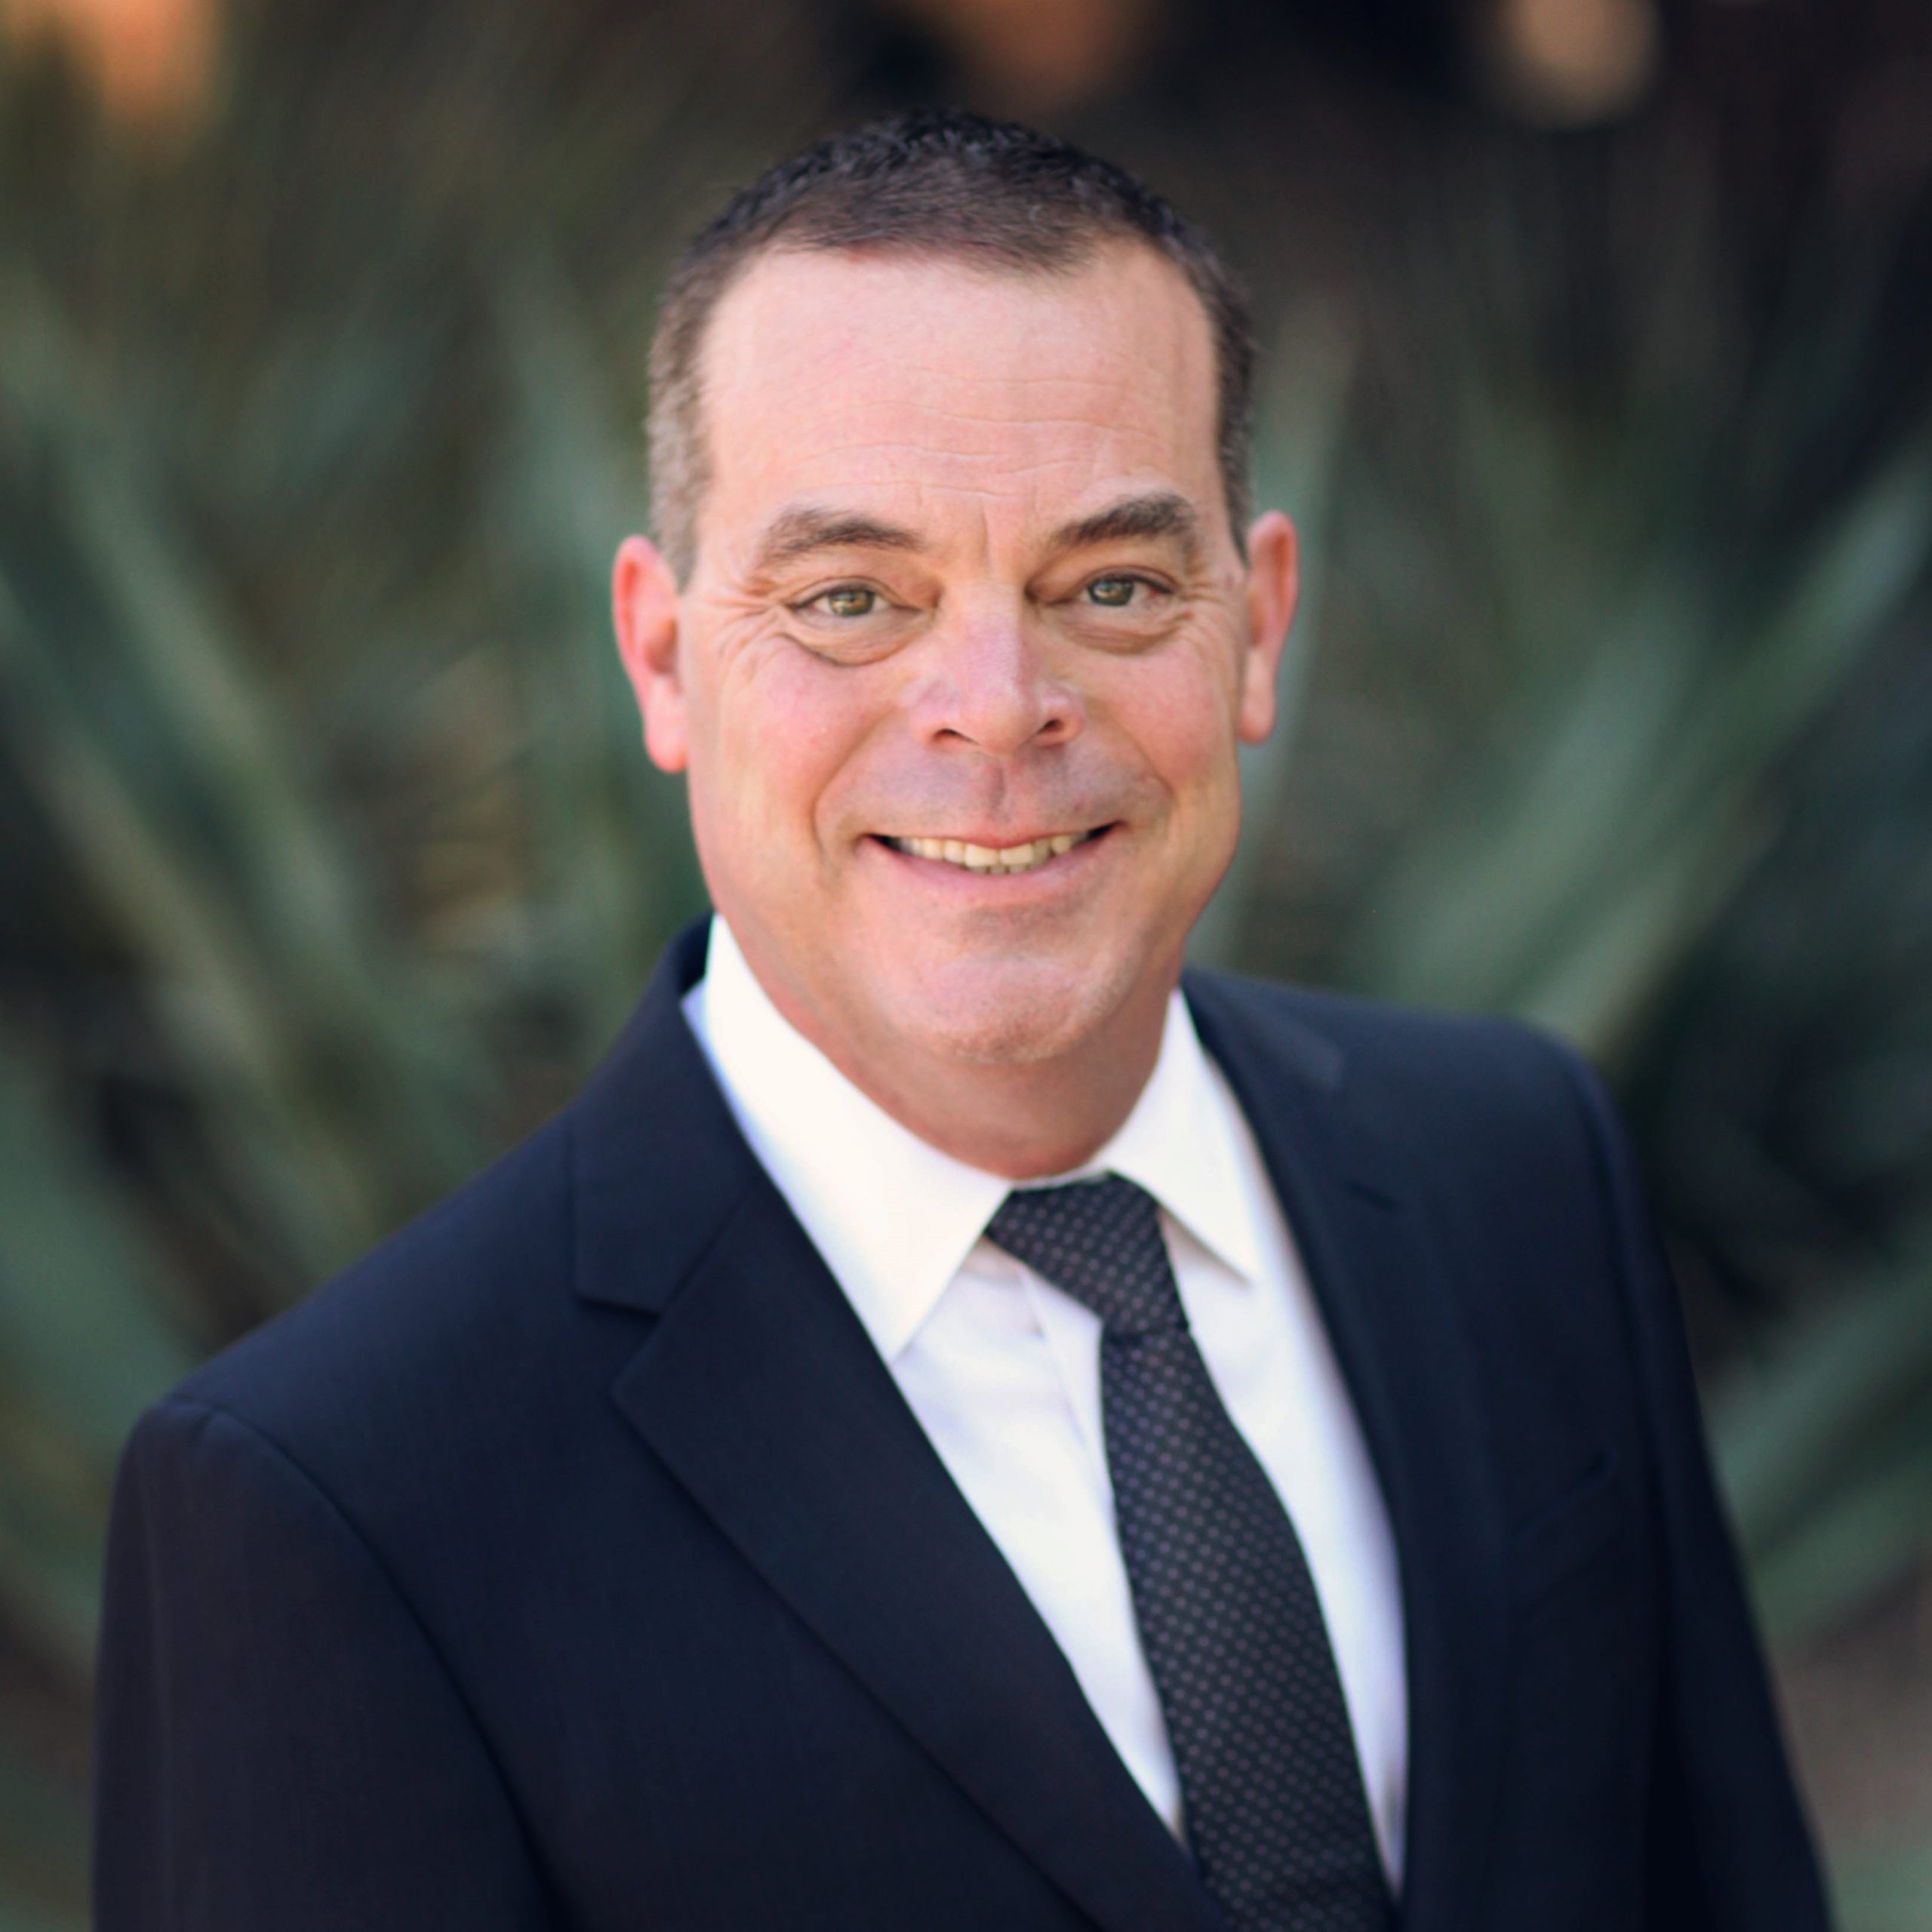 Michael Messer